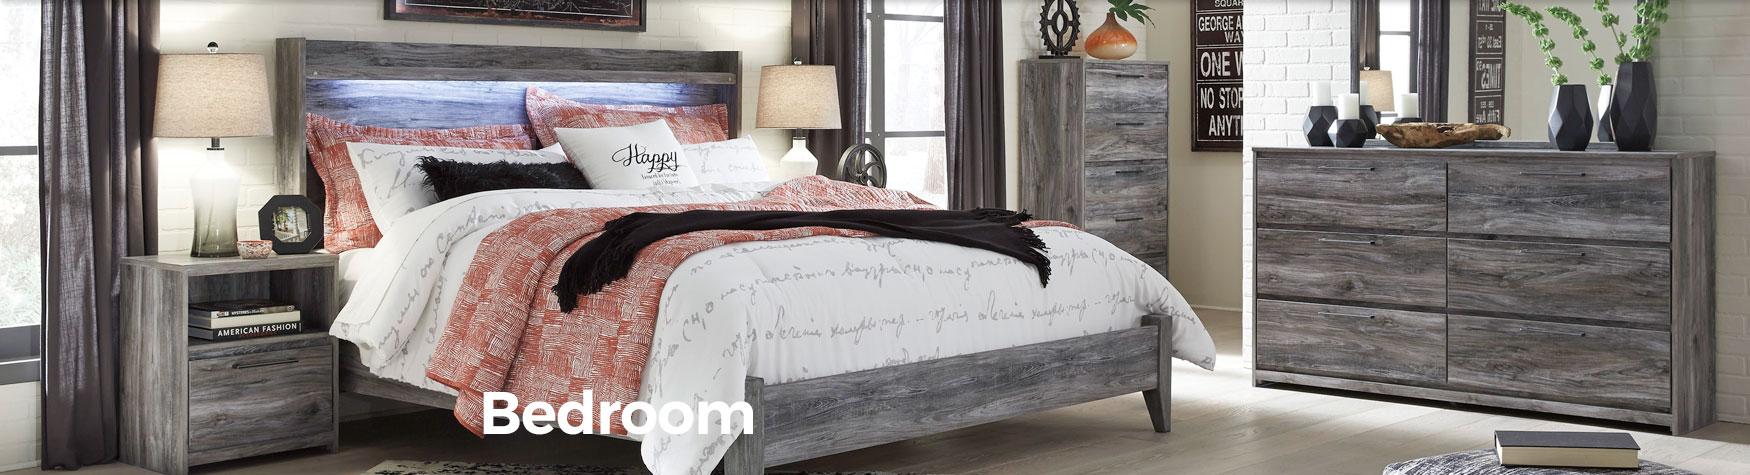 bedroombanner.jpg